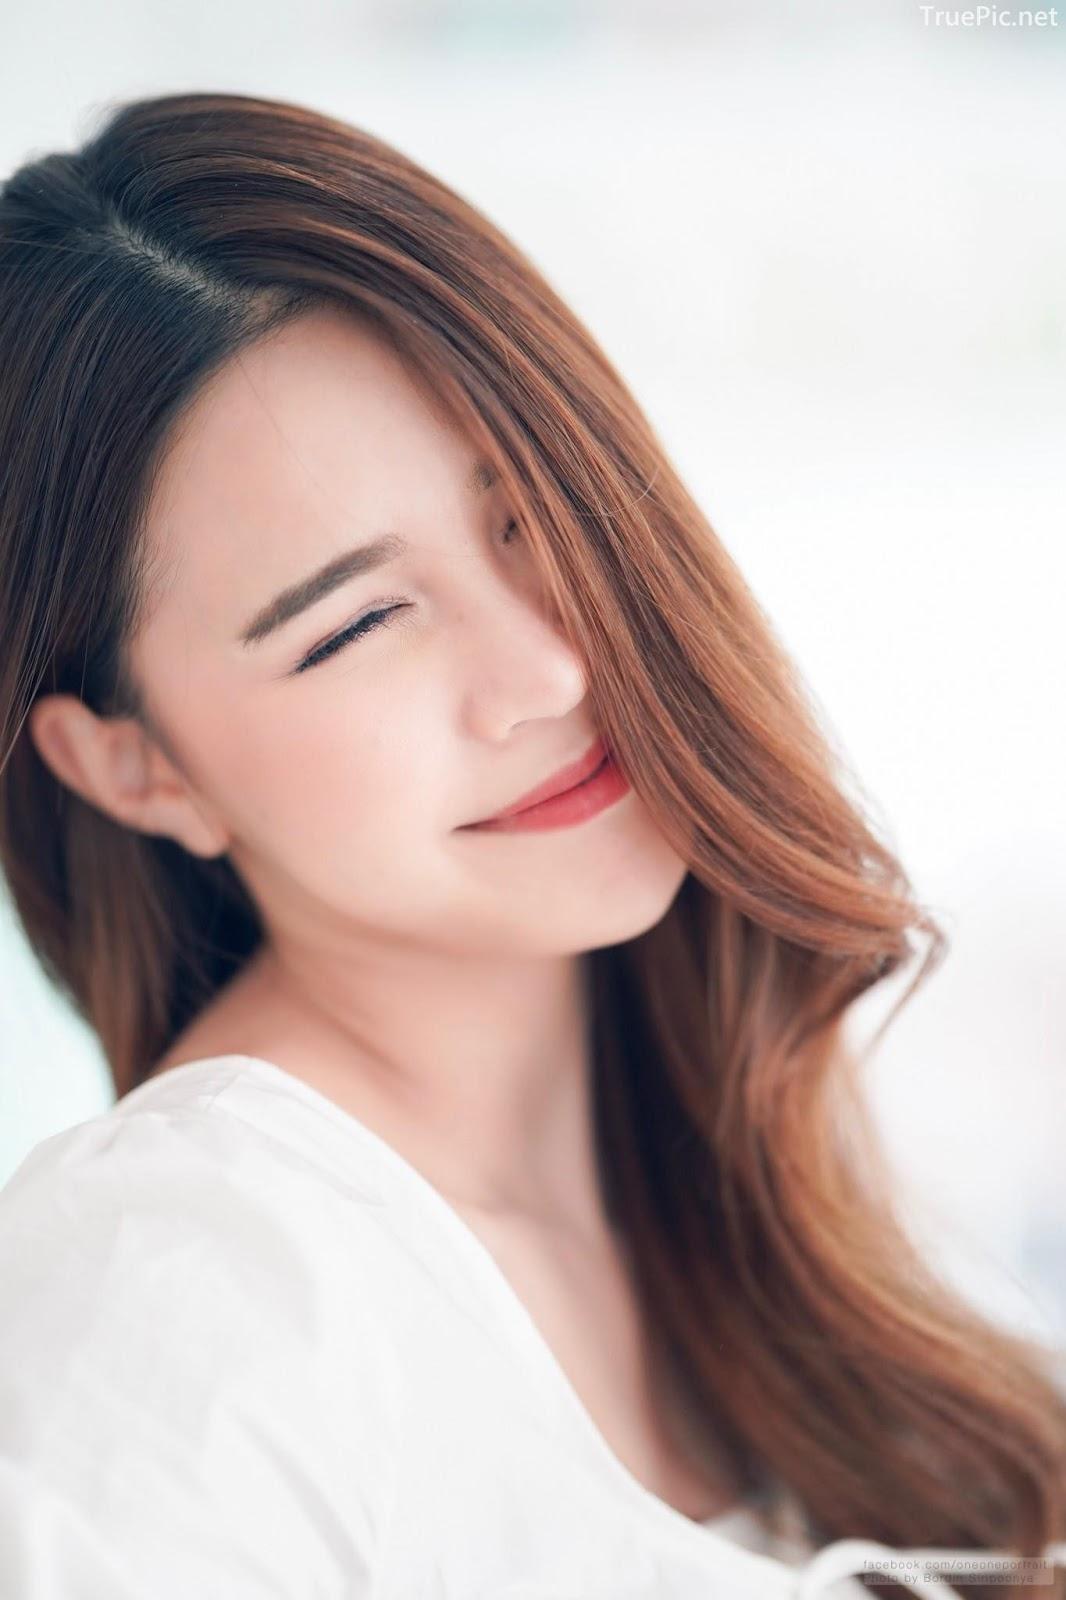 Thailand cute model Supansa Yoopradit (Lorpor) - Lovely smile girl - Picture 3